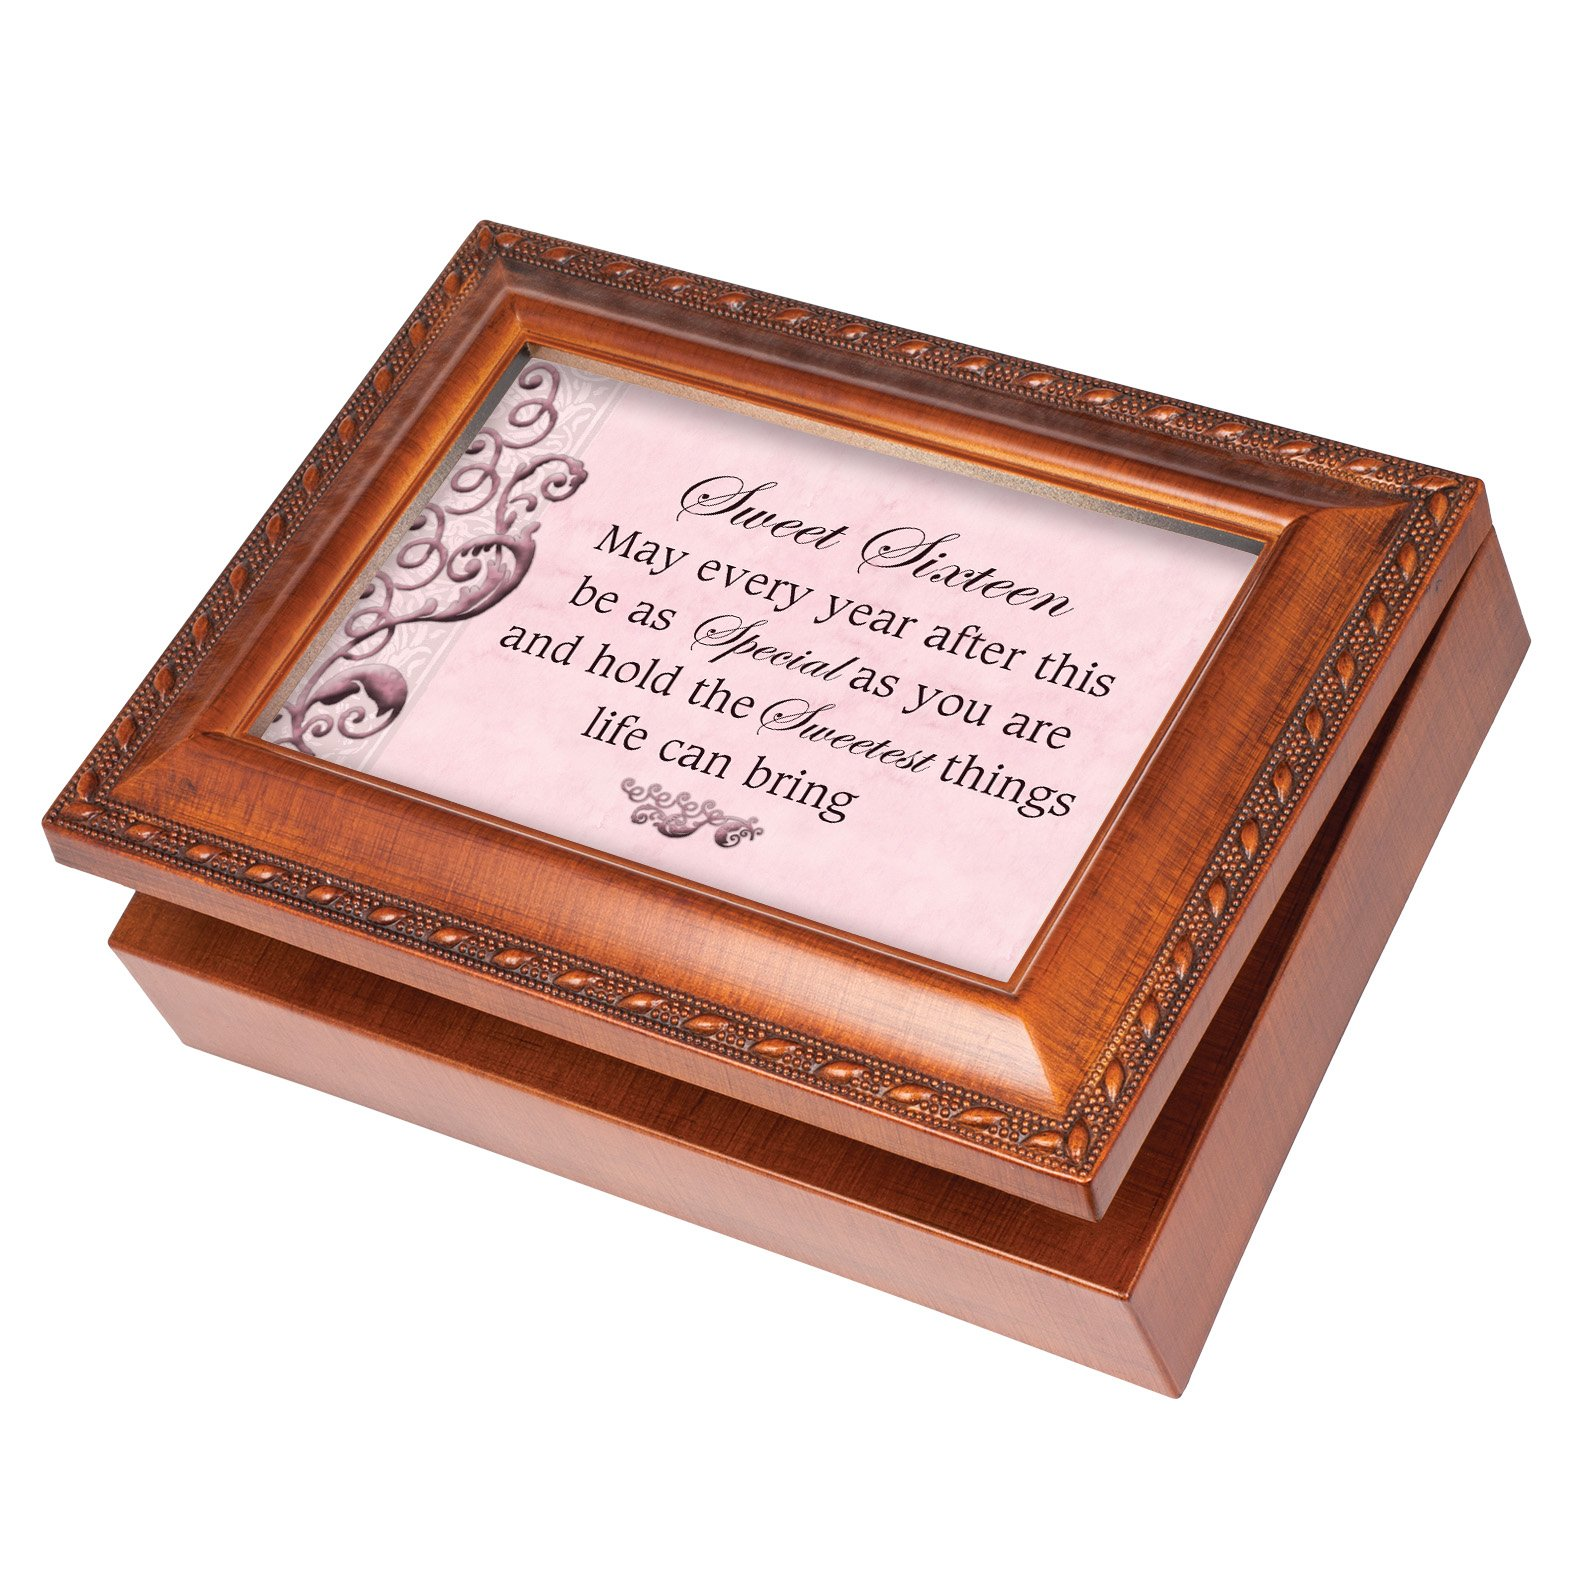 Sweet Sixteen Wood Finish Jewelry Music Box Plays Tune You Are My Sunshine